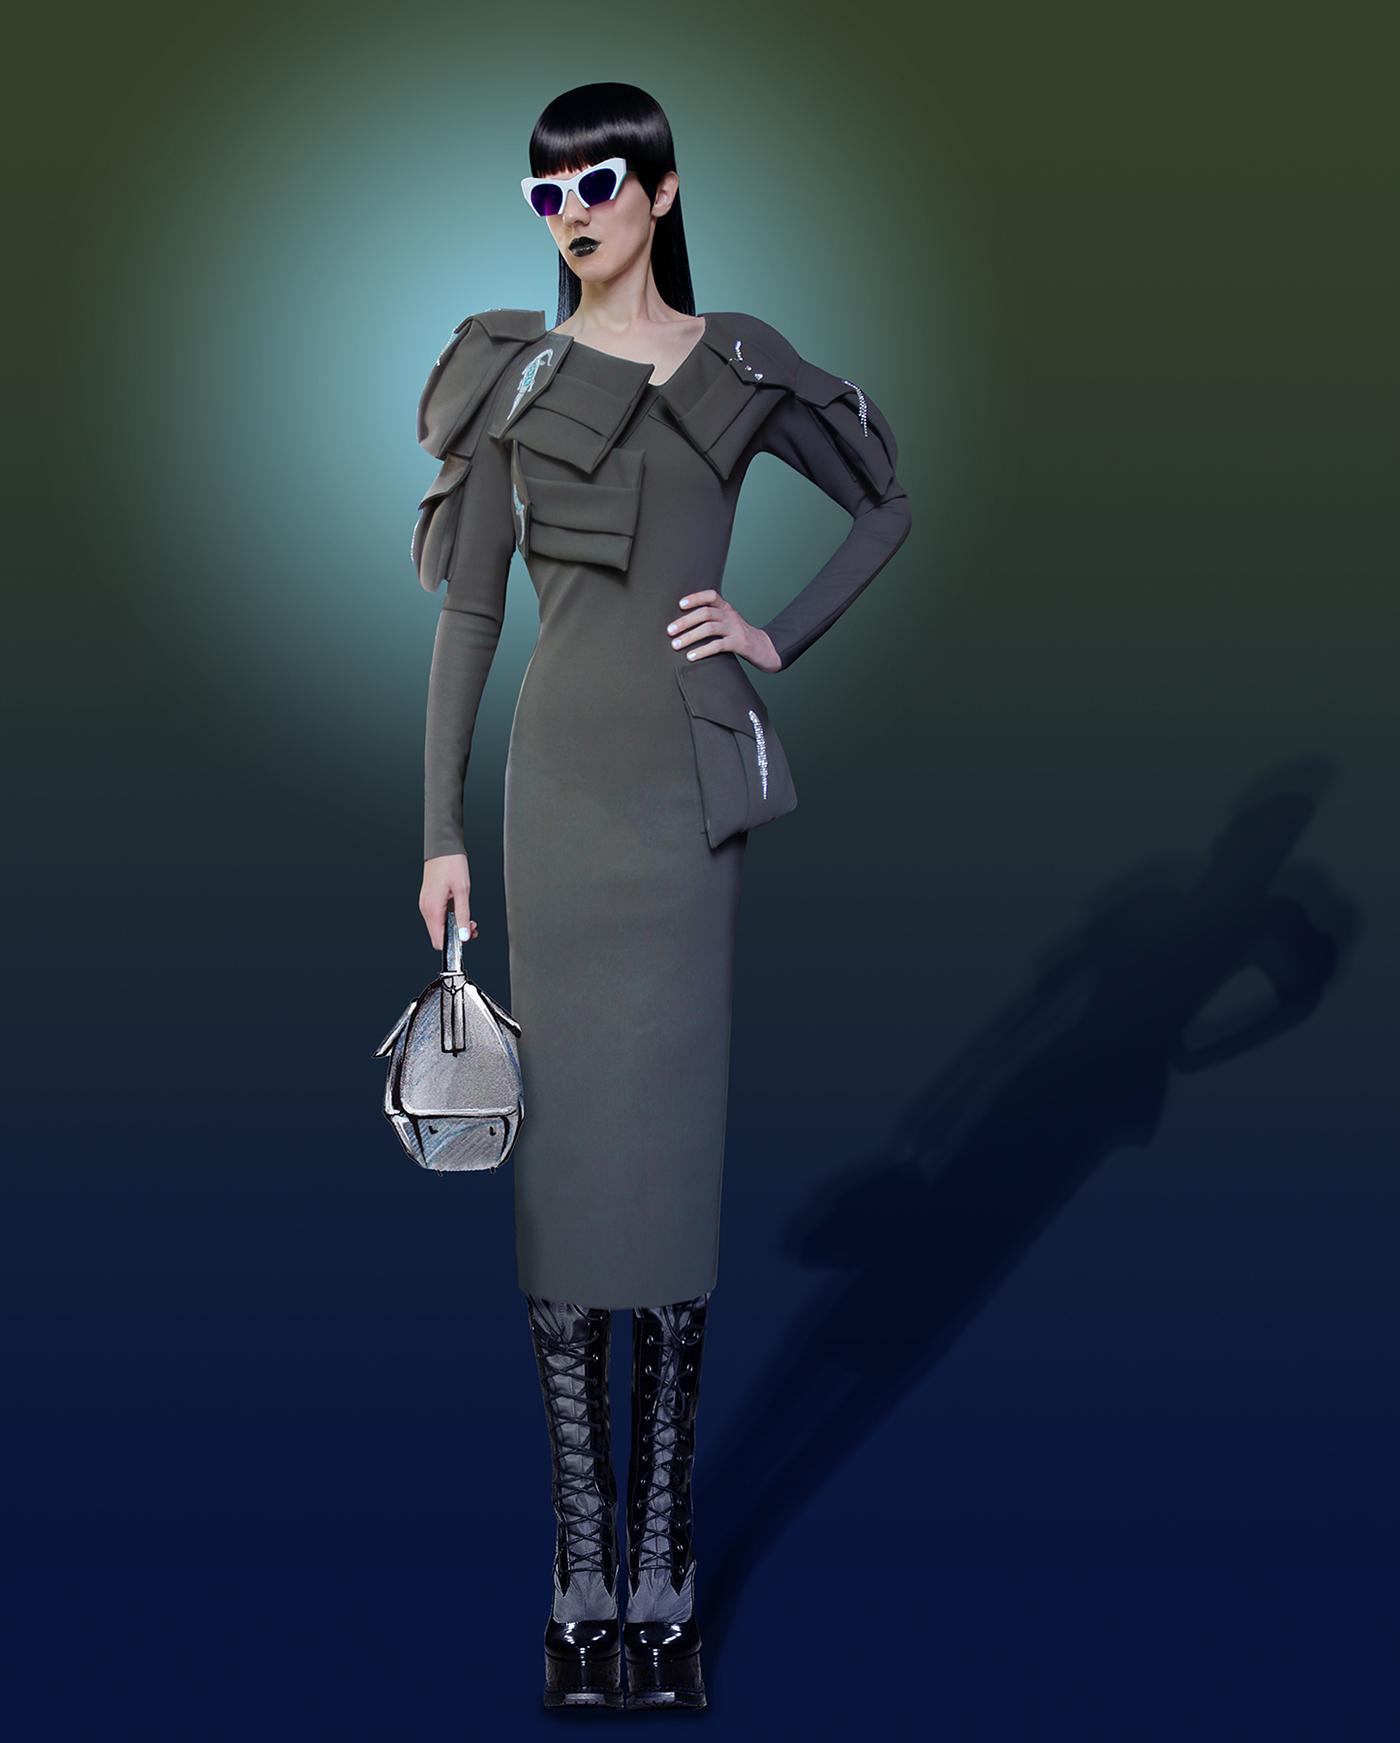 Venus de Milo crocodile milan Italy art painting   dress coat Military Classic